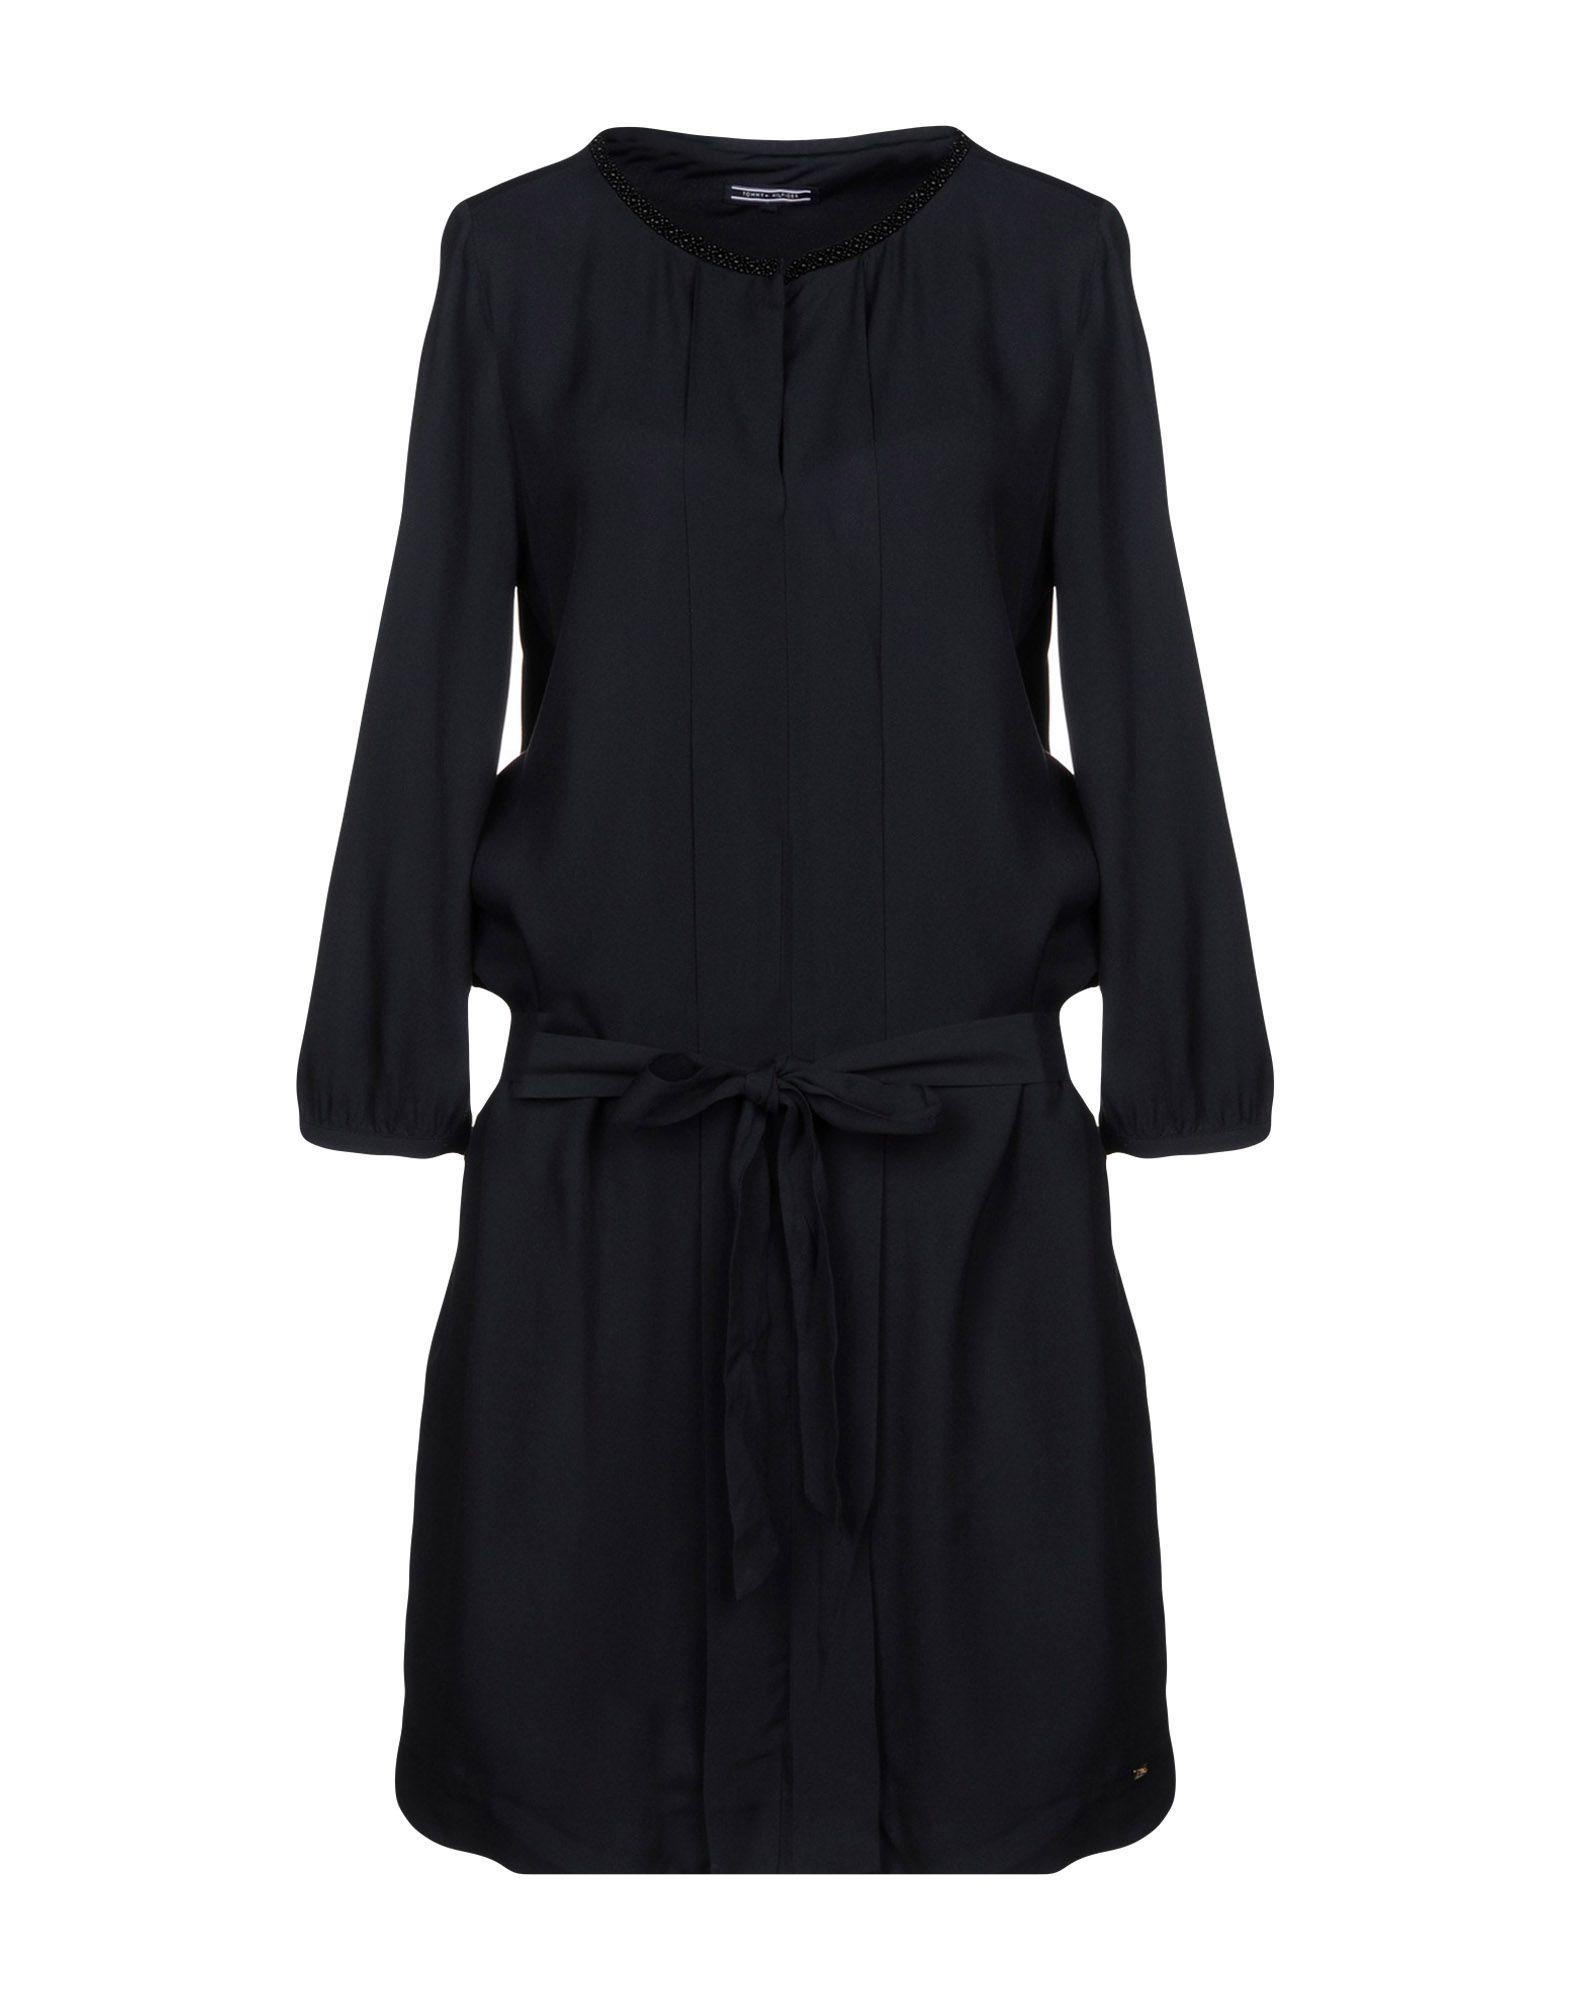 d3c5e8f7ce3 Buy tommy hilfiger dresses for women - Best women's tommy hilfiger ...